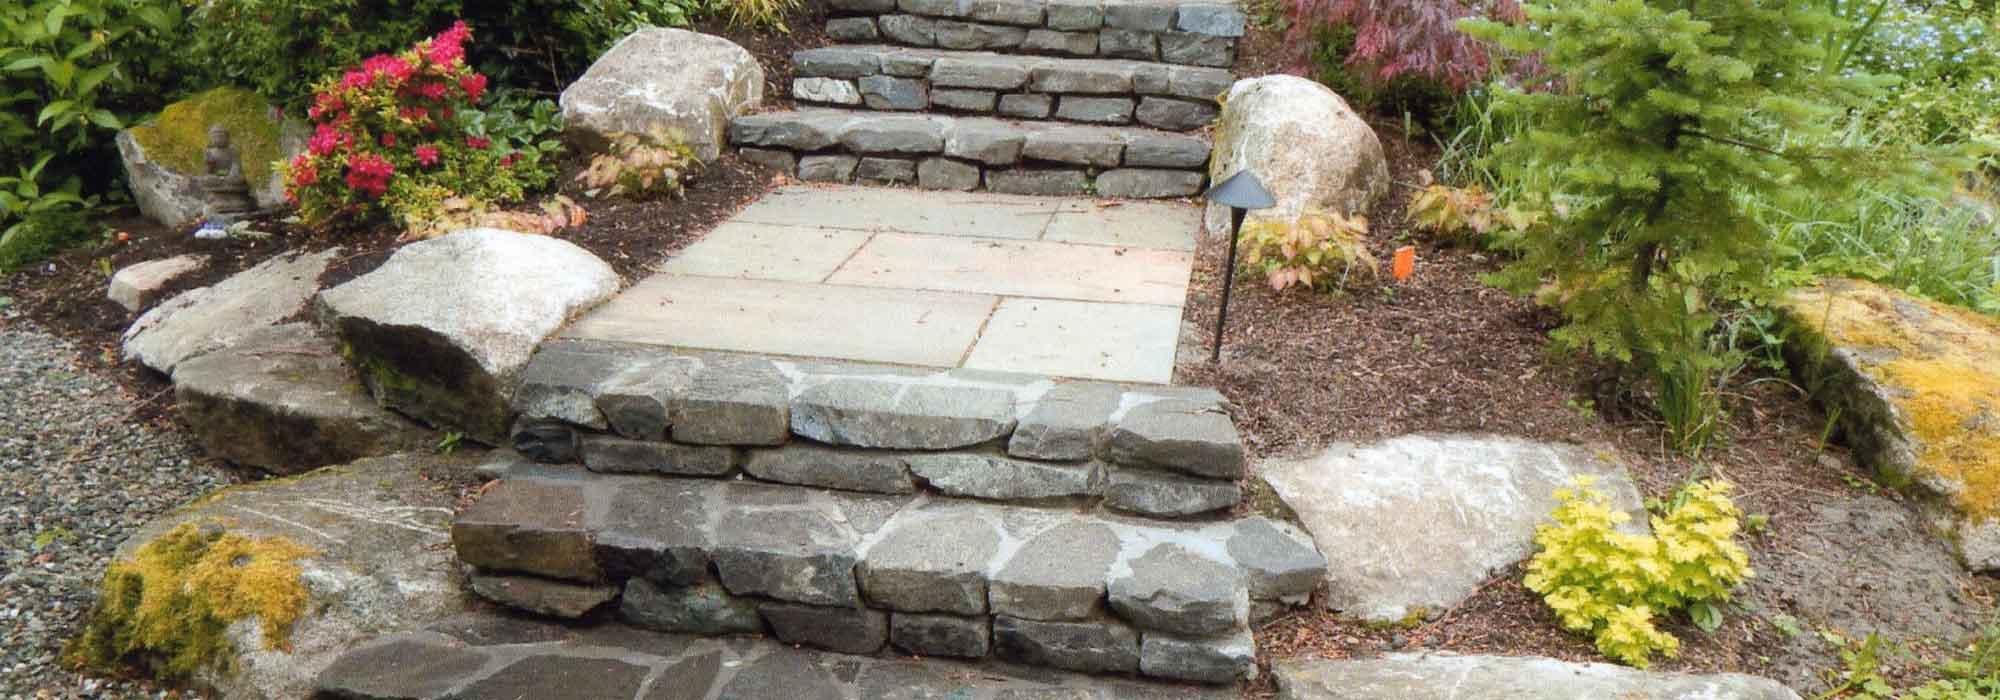 L & L Excavating & Landscaping Stone Bark Gravel